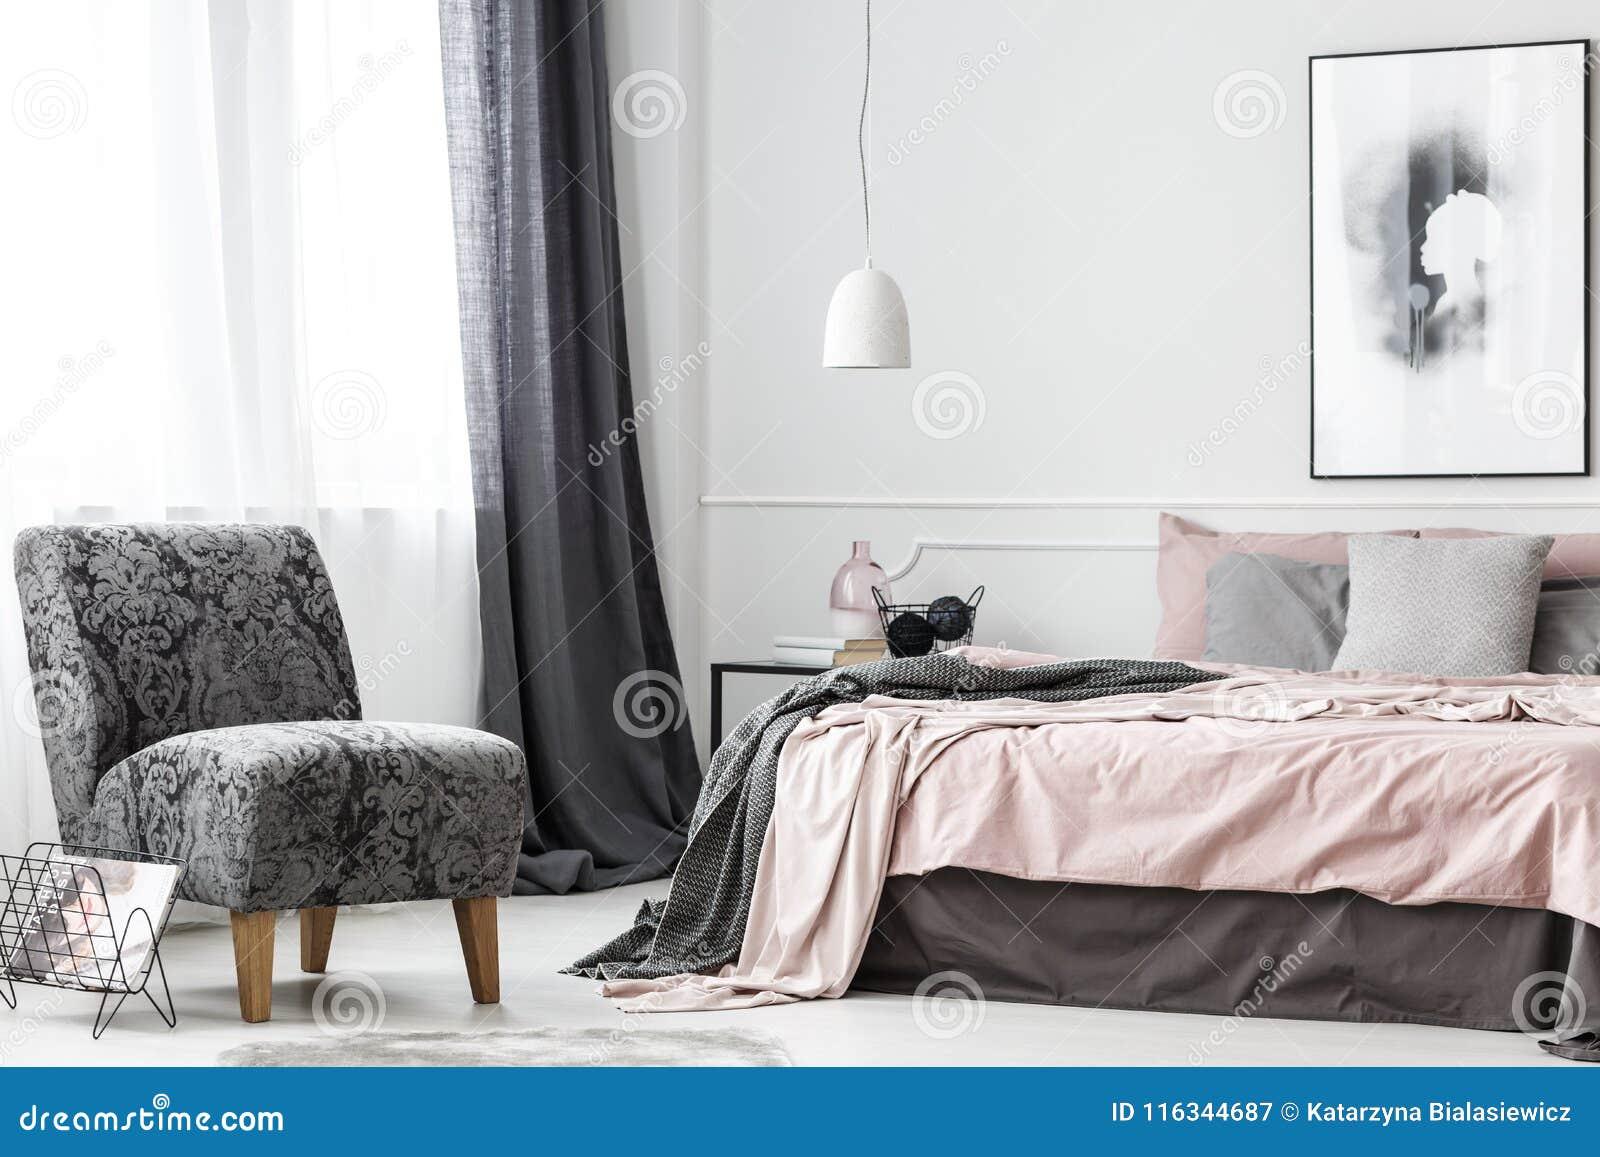 Элегантный женский интерьер спальни